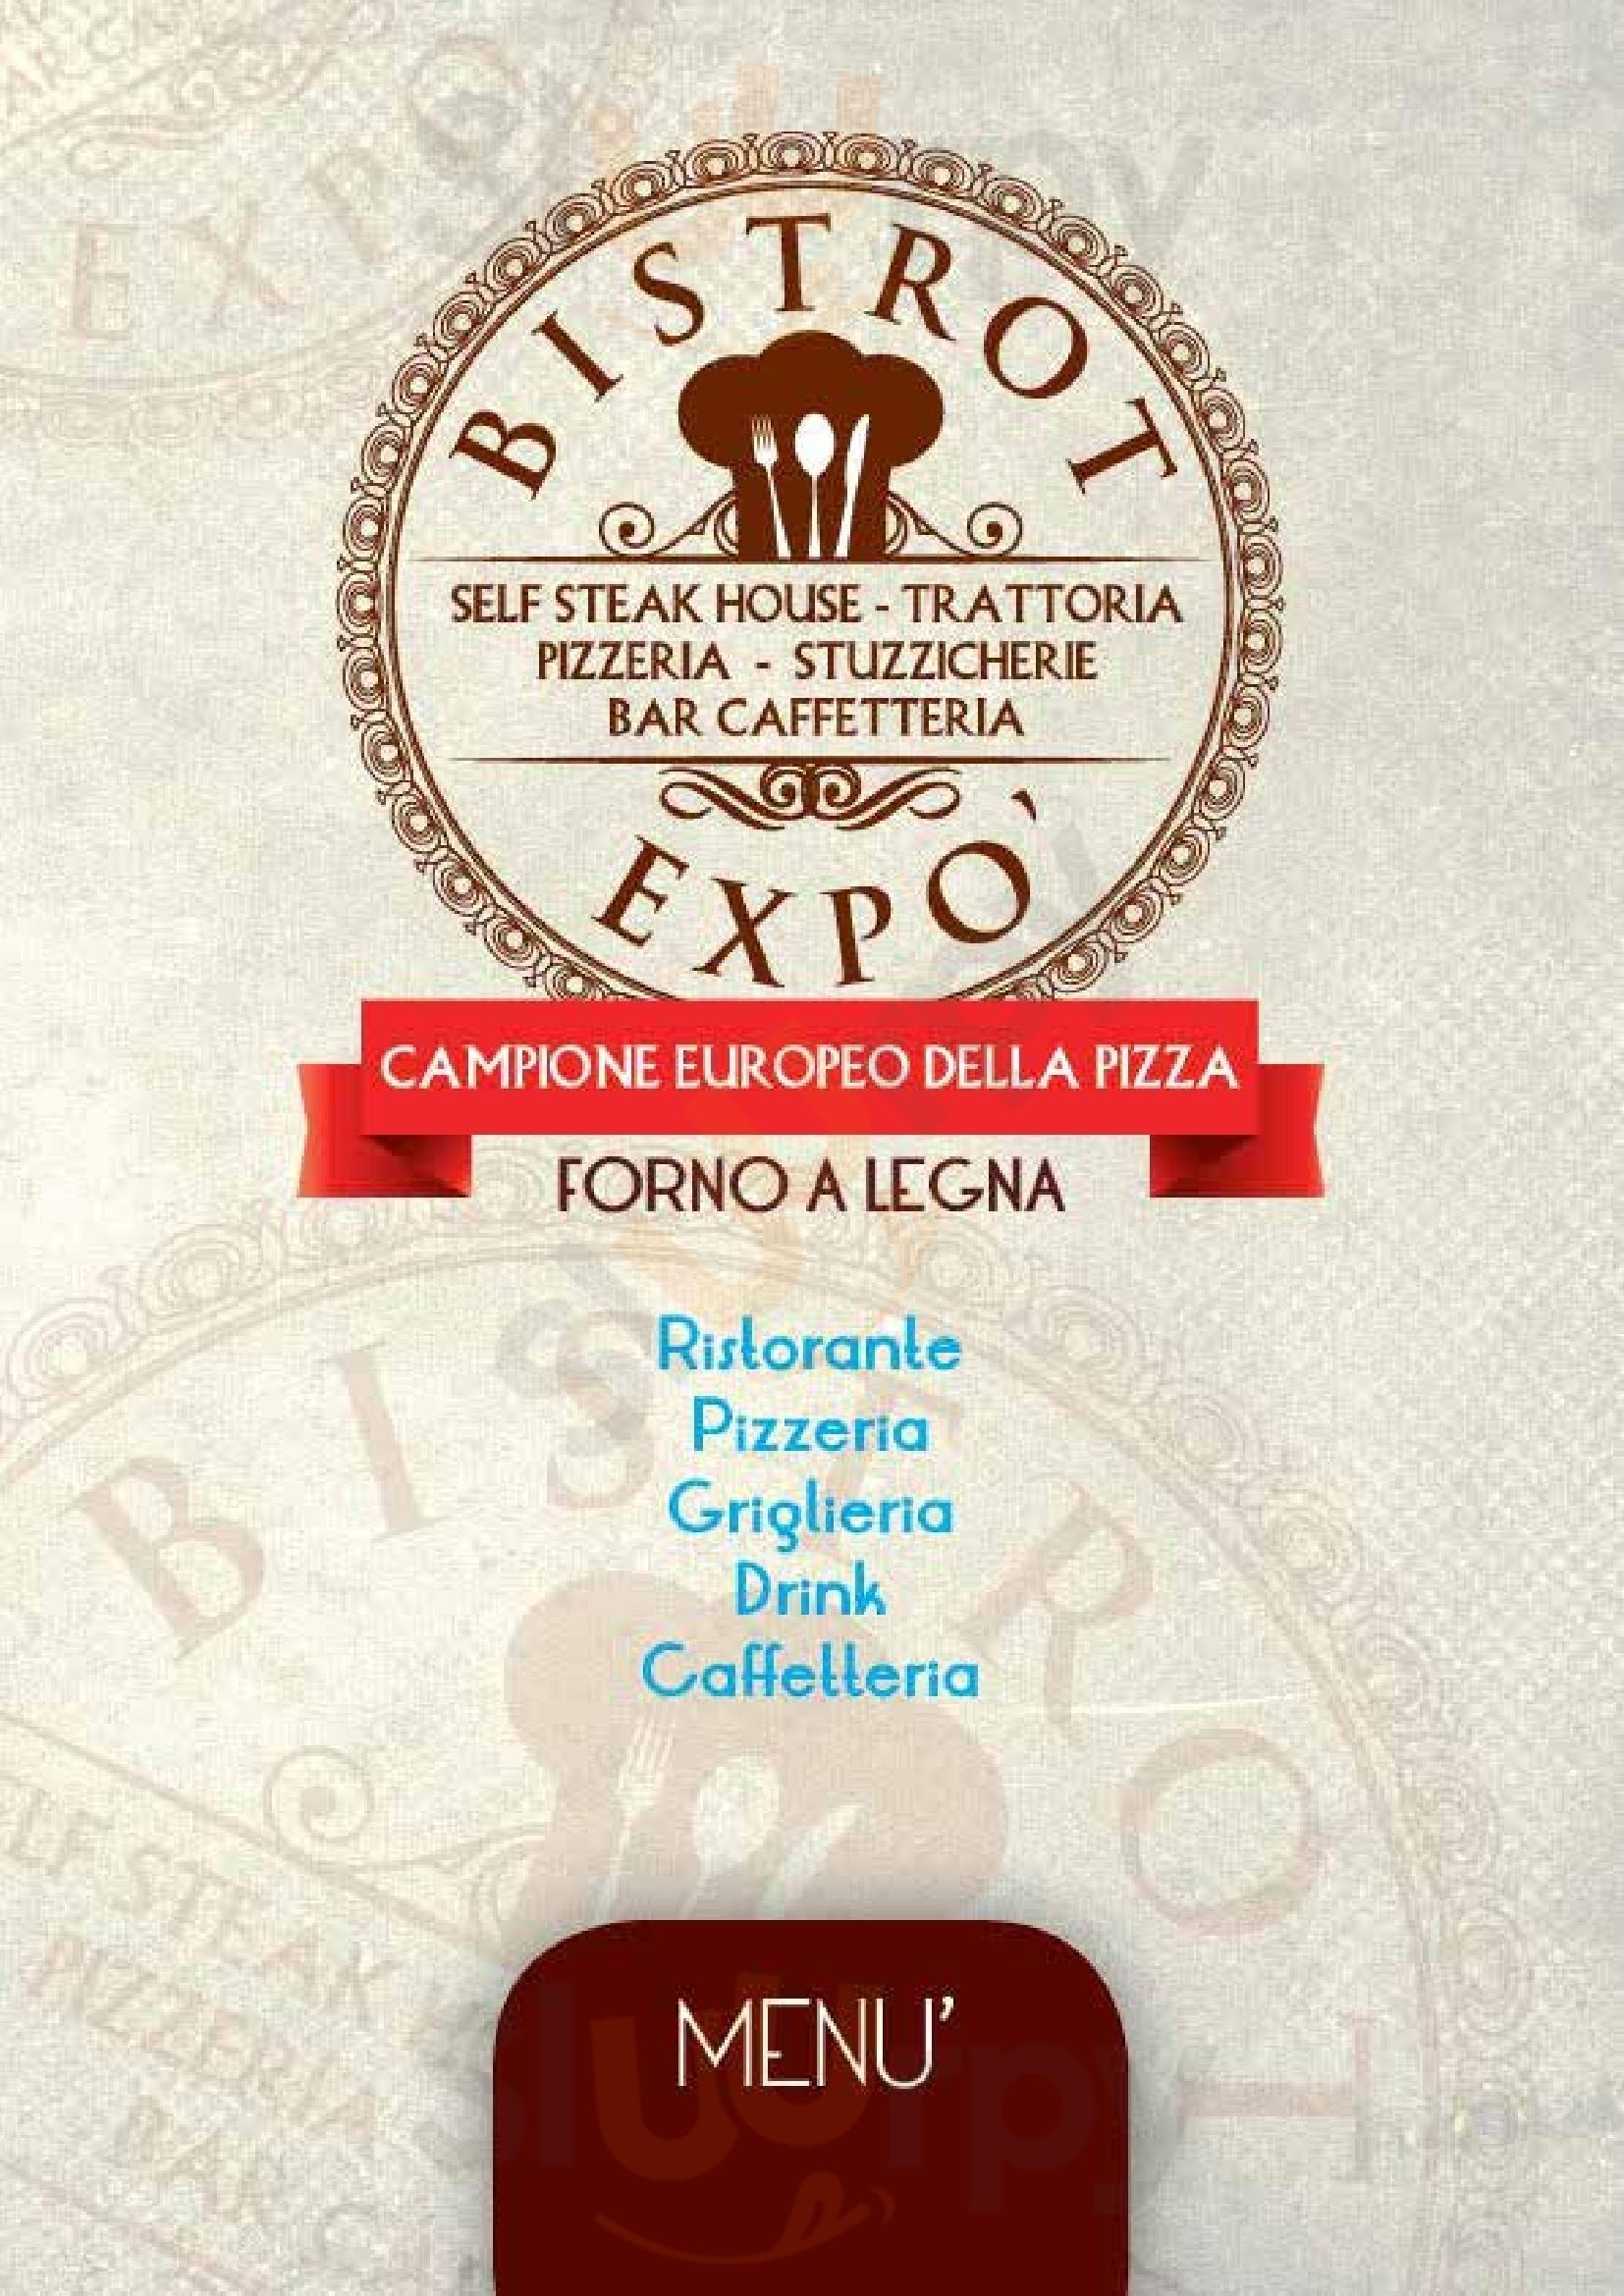 Bistrot Expo Gavirate menù 1 pagina